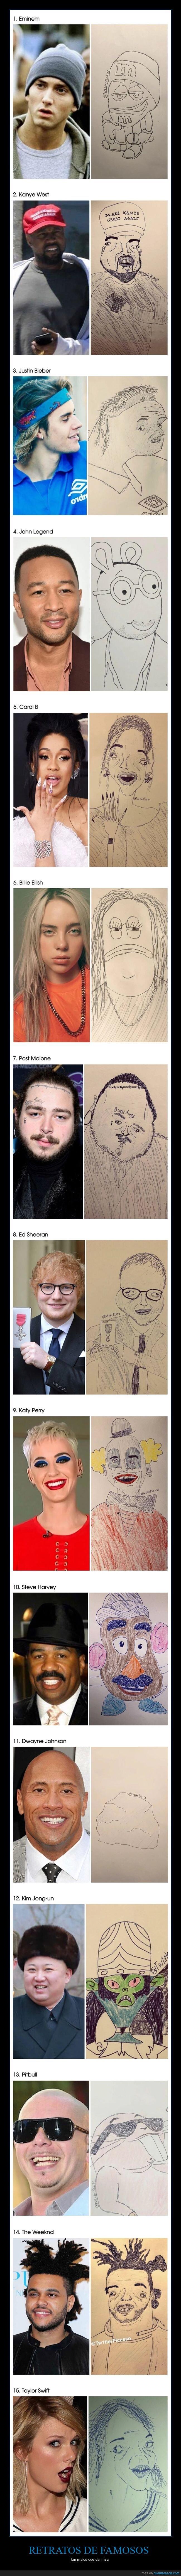 famosos,malos,retratos